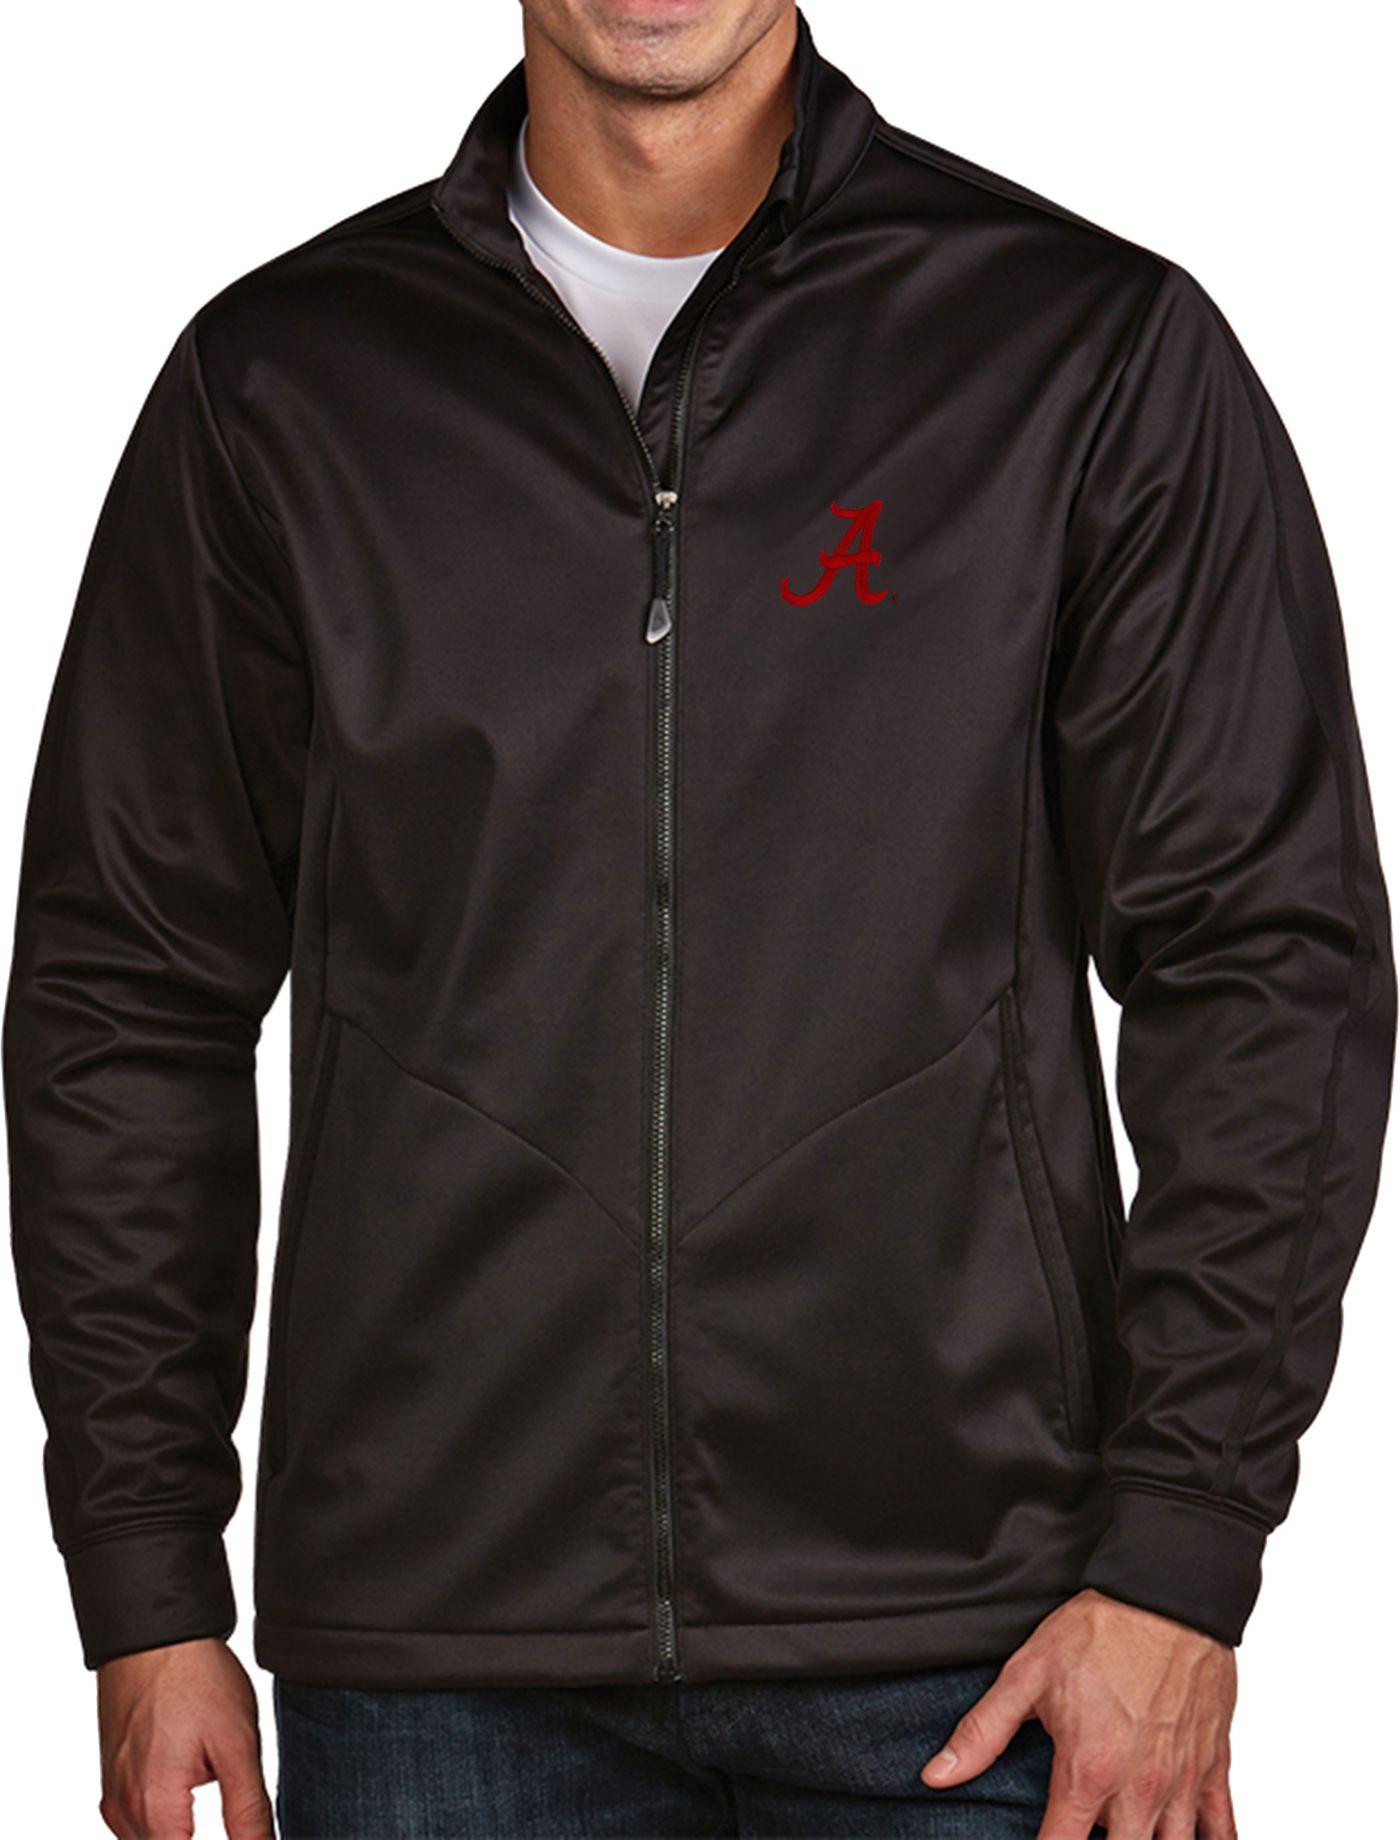 Antigua Men's Alabama Crimson Tide Black Full-Zip Golf Jacket